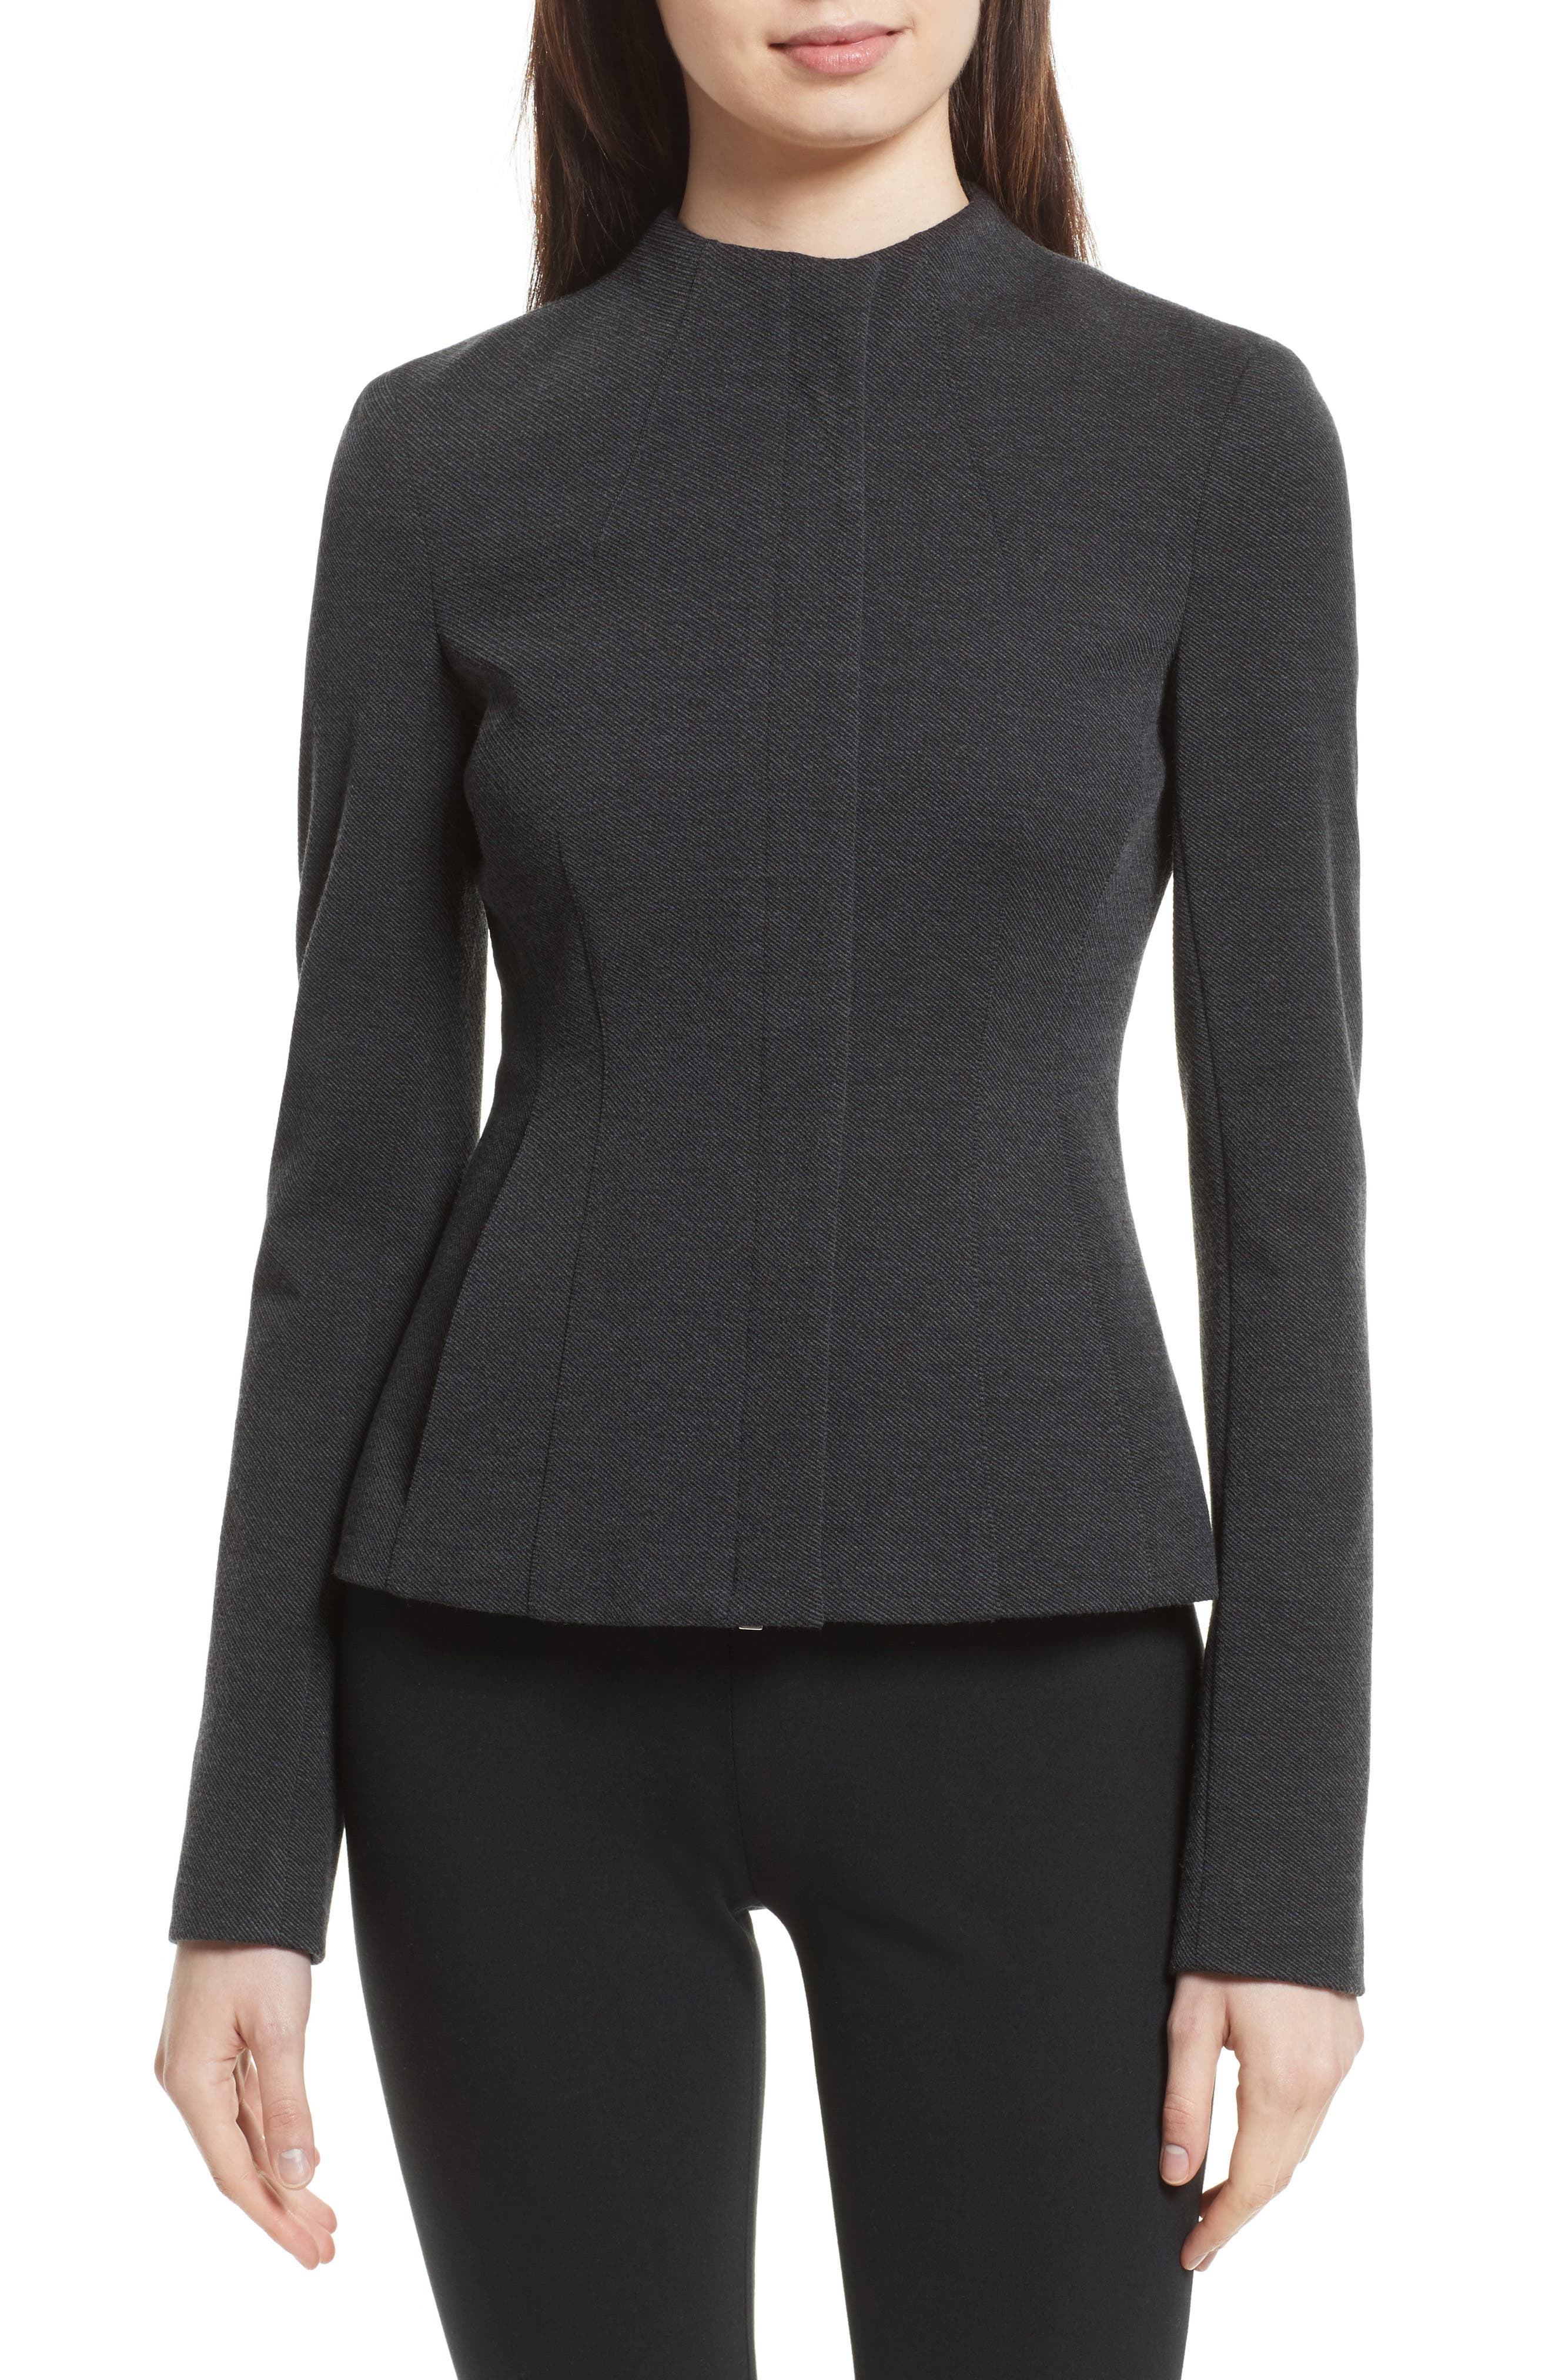 Sculpted Knit Twill Jacket,                             Main thumbnail 1, color,                             Dark Charcoal